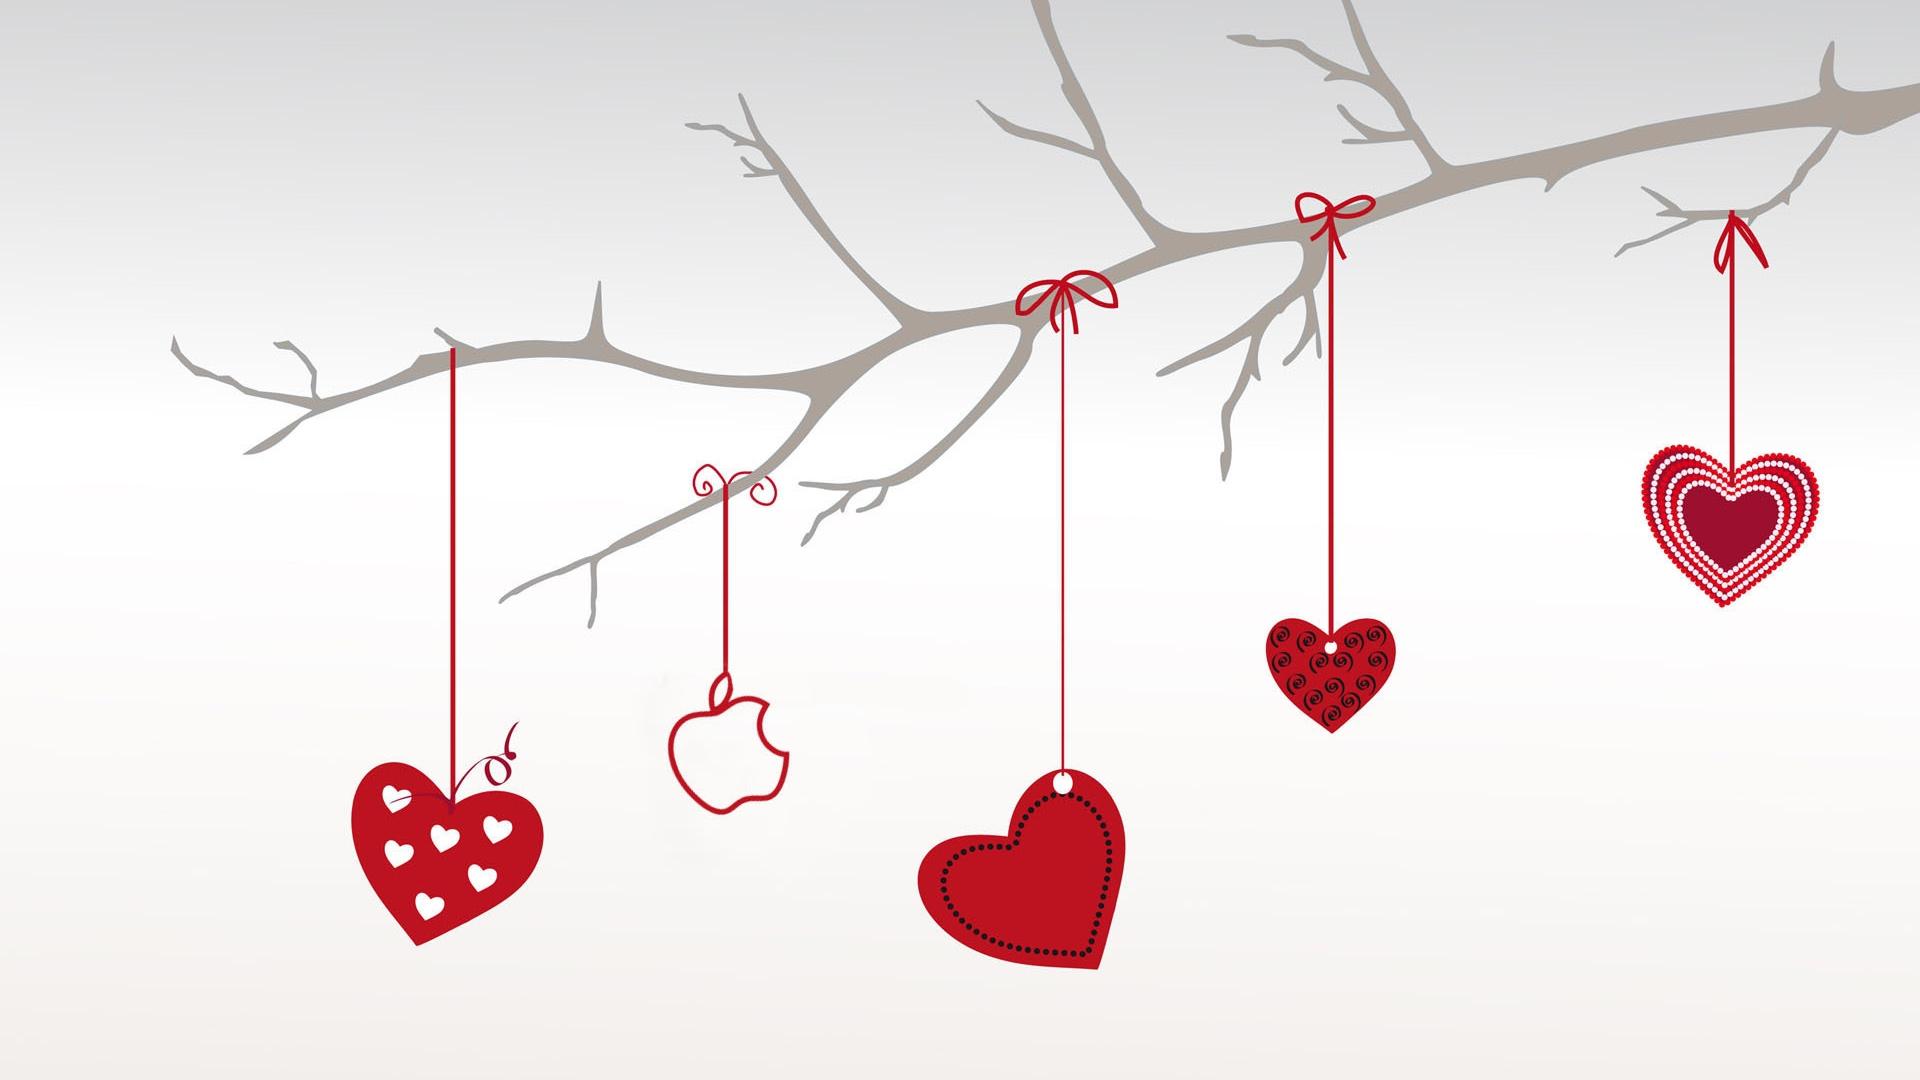 valentines day 1080p wallpaper